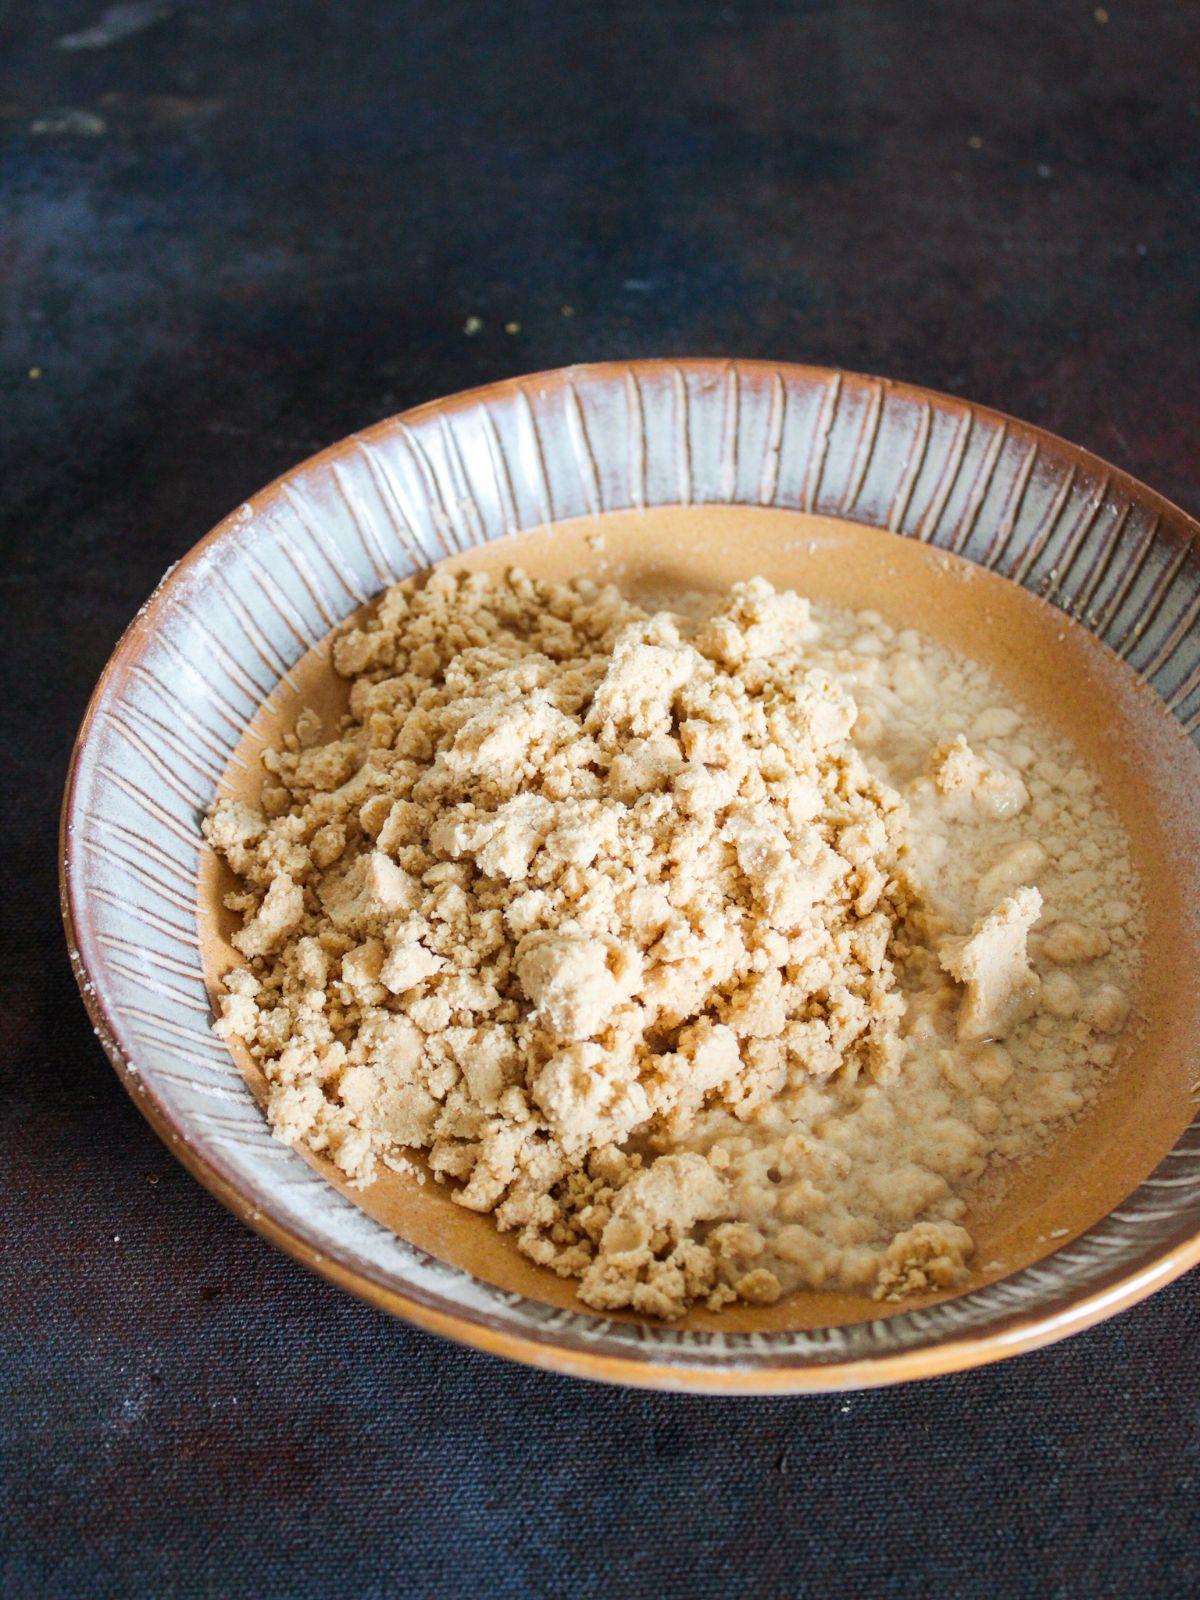 Crumble dough mixture in shallow bowl